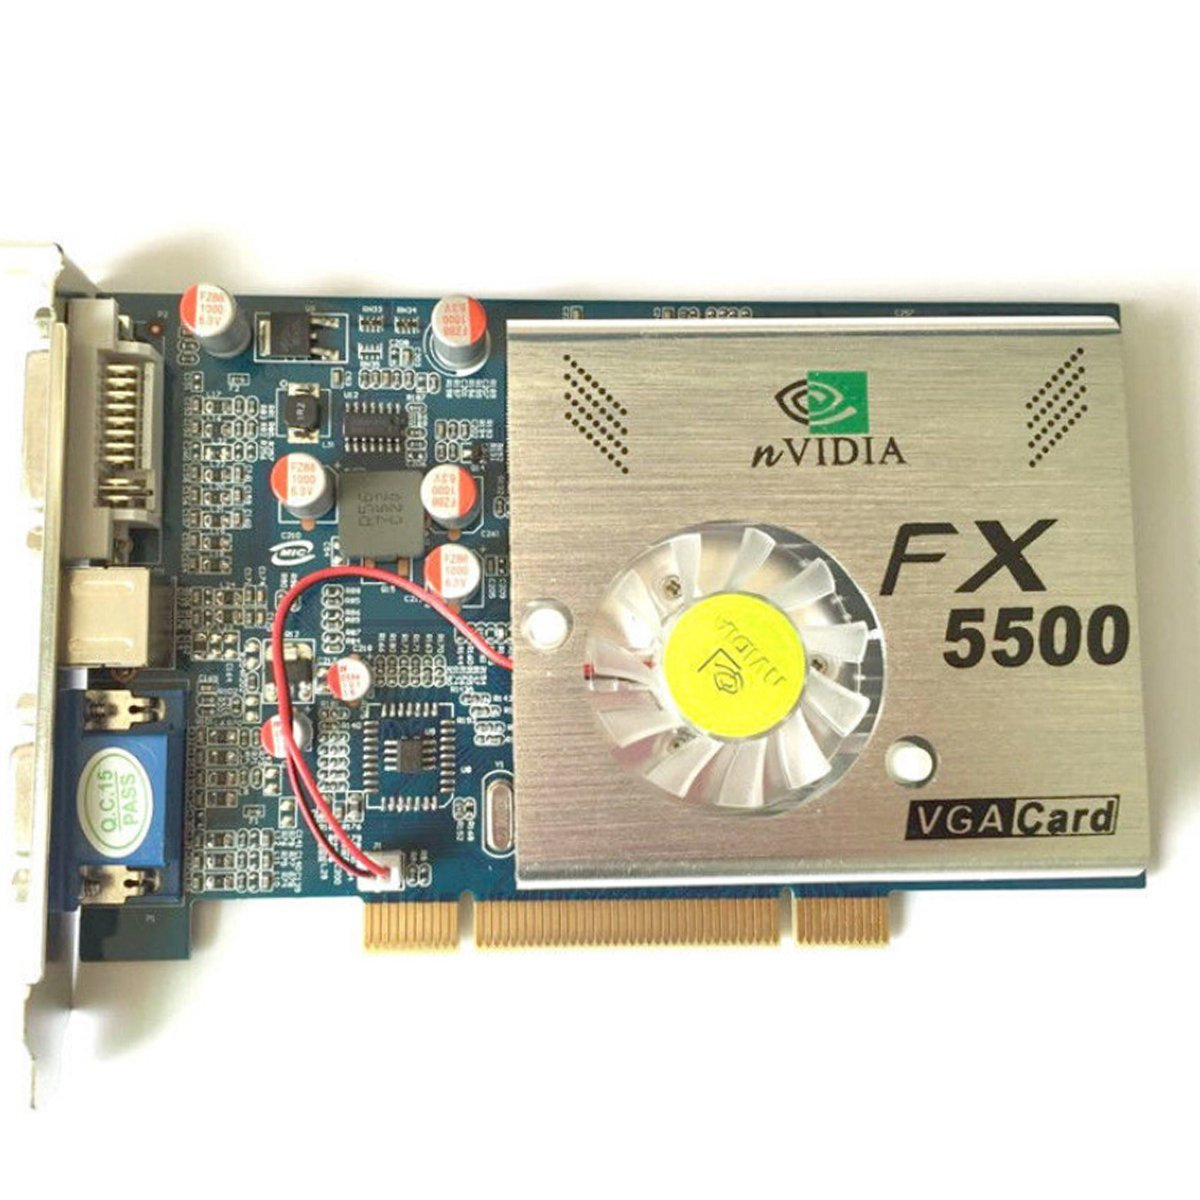 Cheap Geforce Fx 5500 256mb Find Geforce Fx 5500 256mb Deals On Line At Alibaba Com